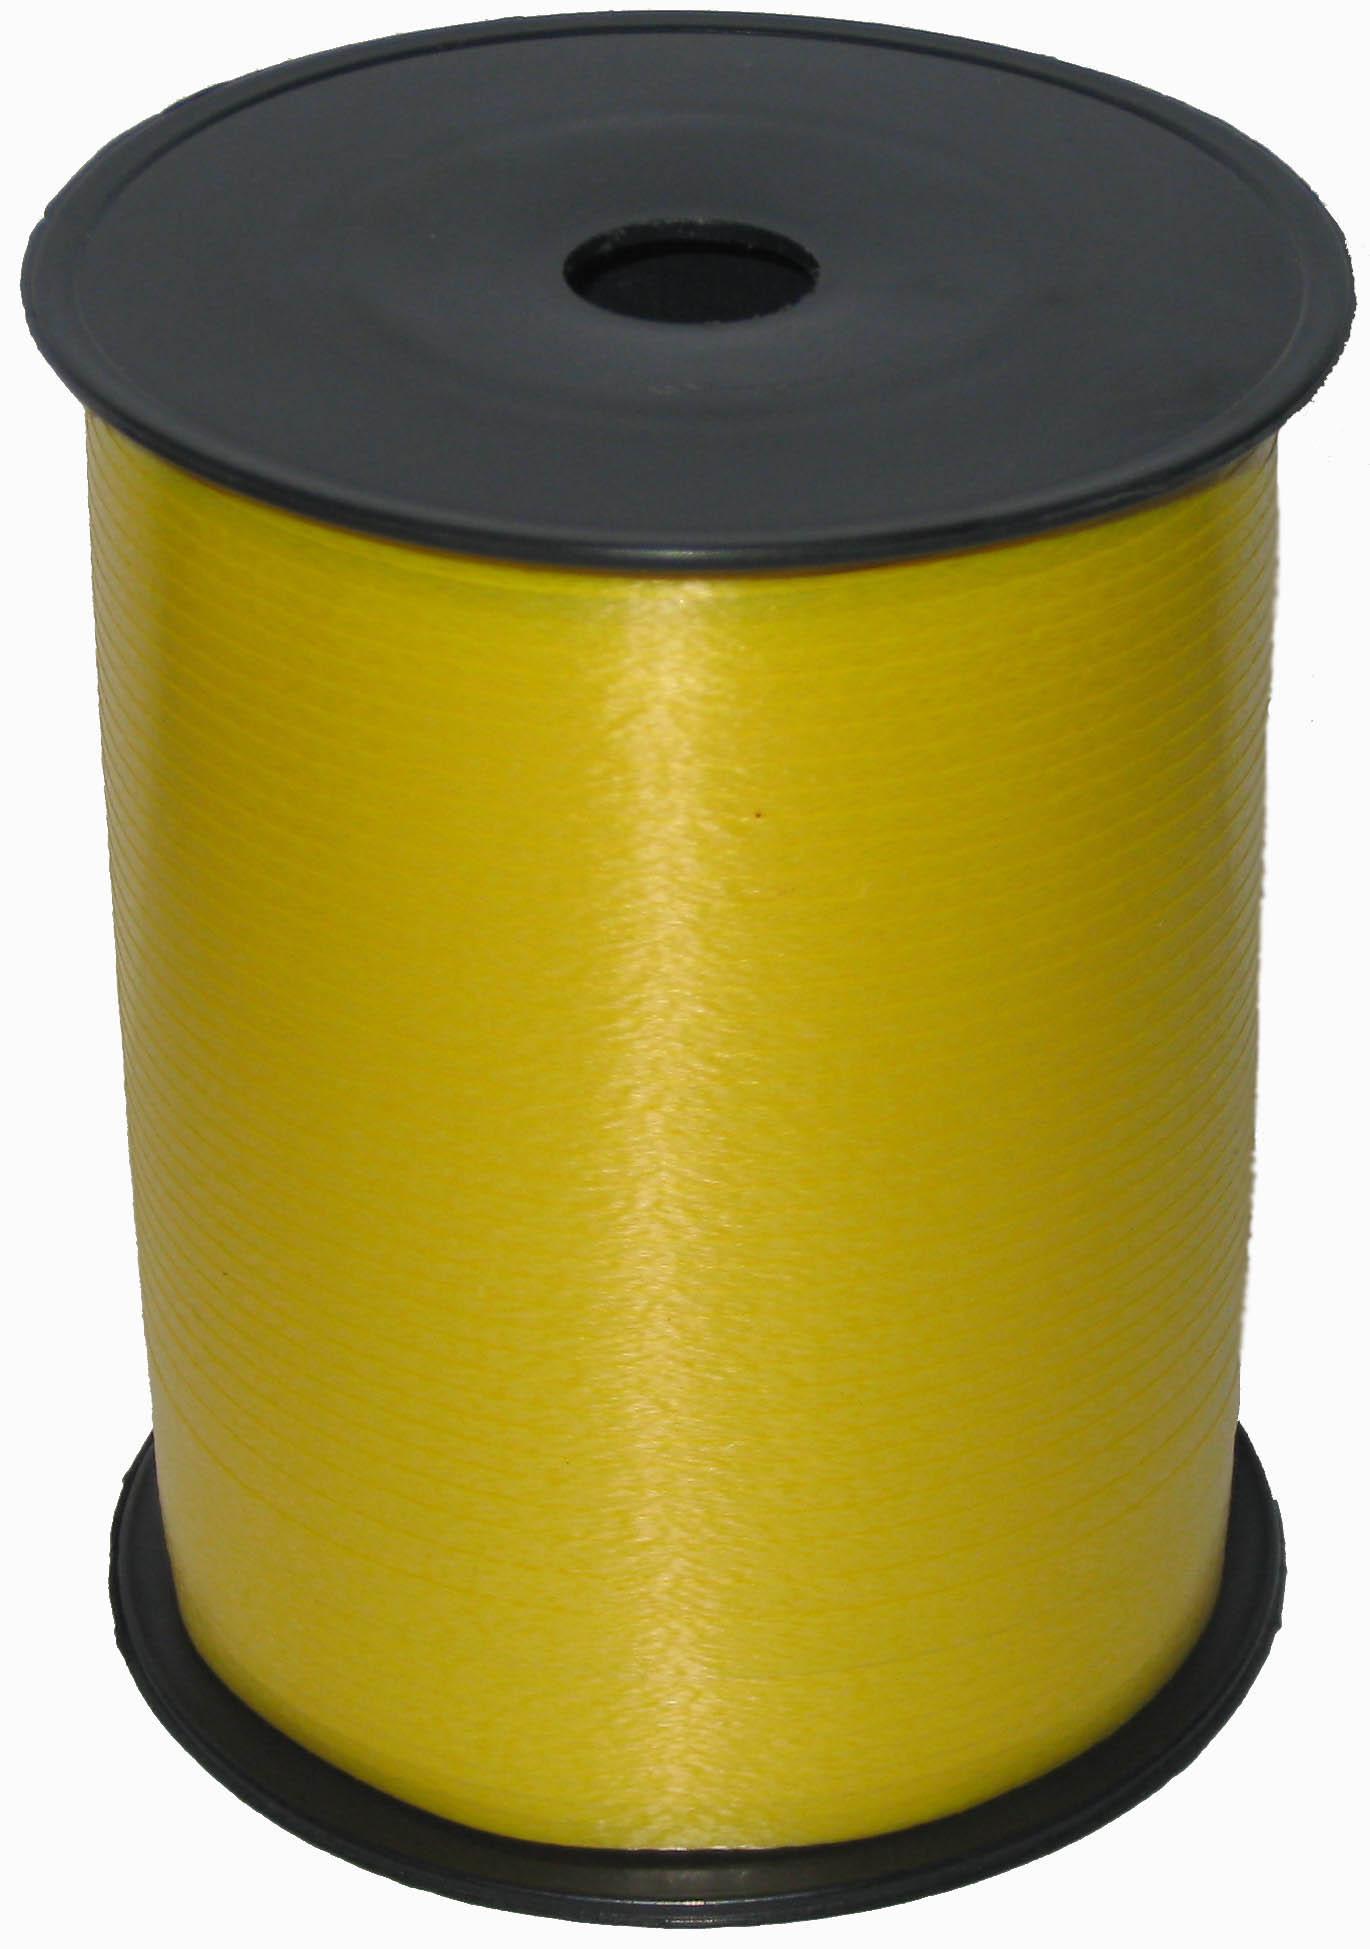 Лента цвет Желтый, бобина 0,5 см / 500 м, Россия